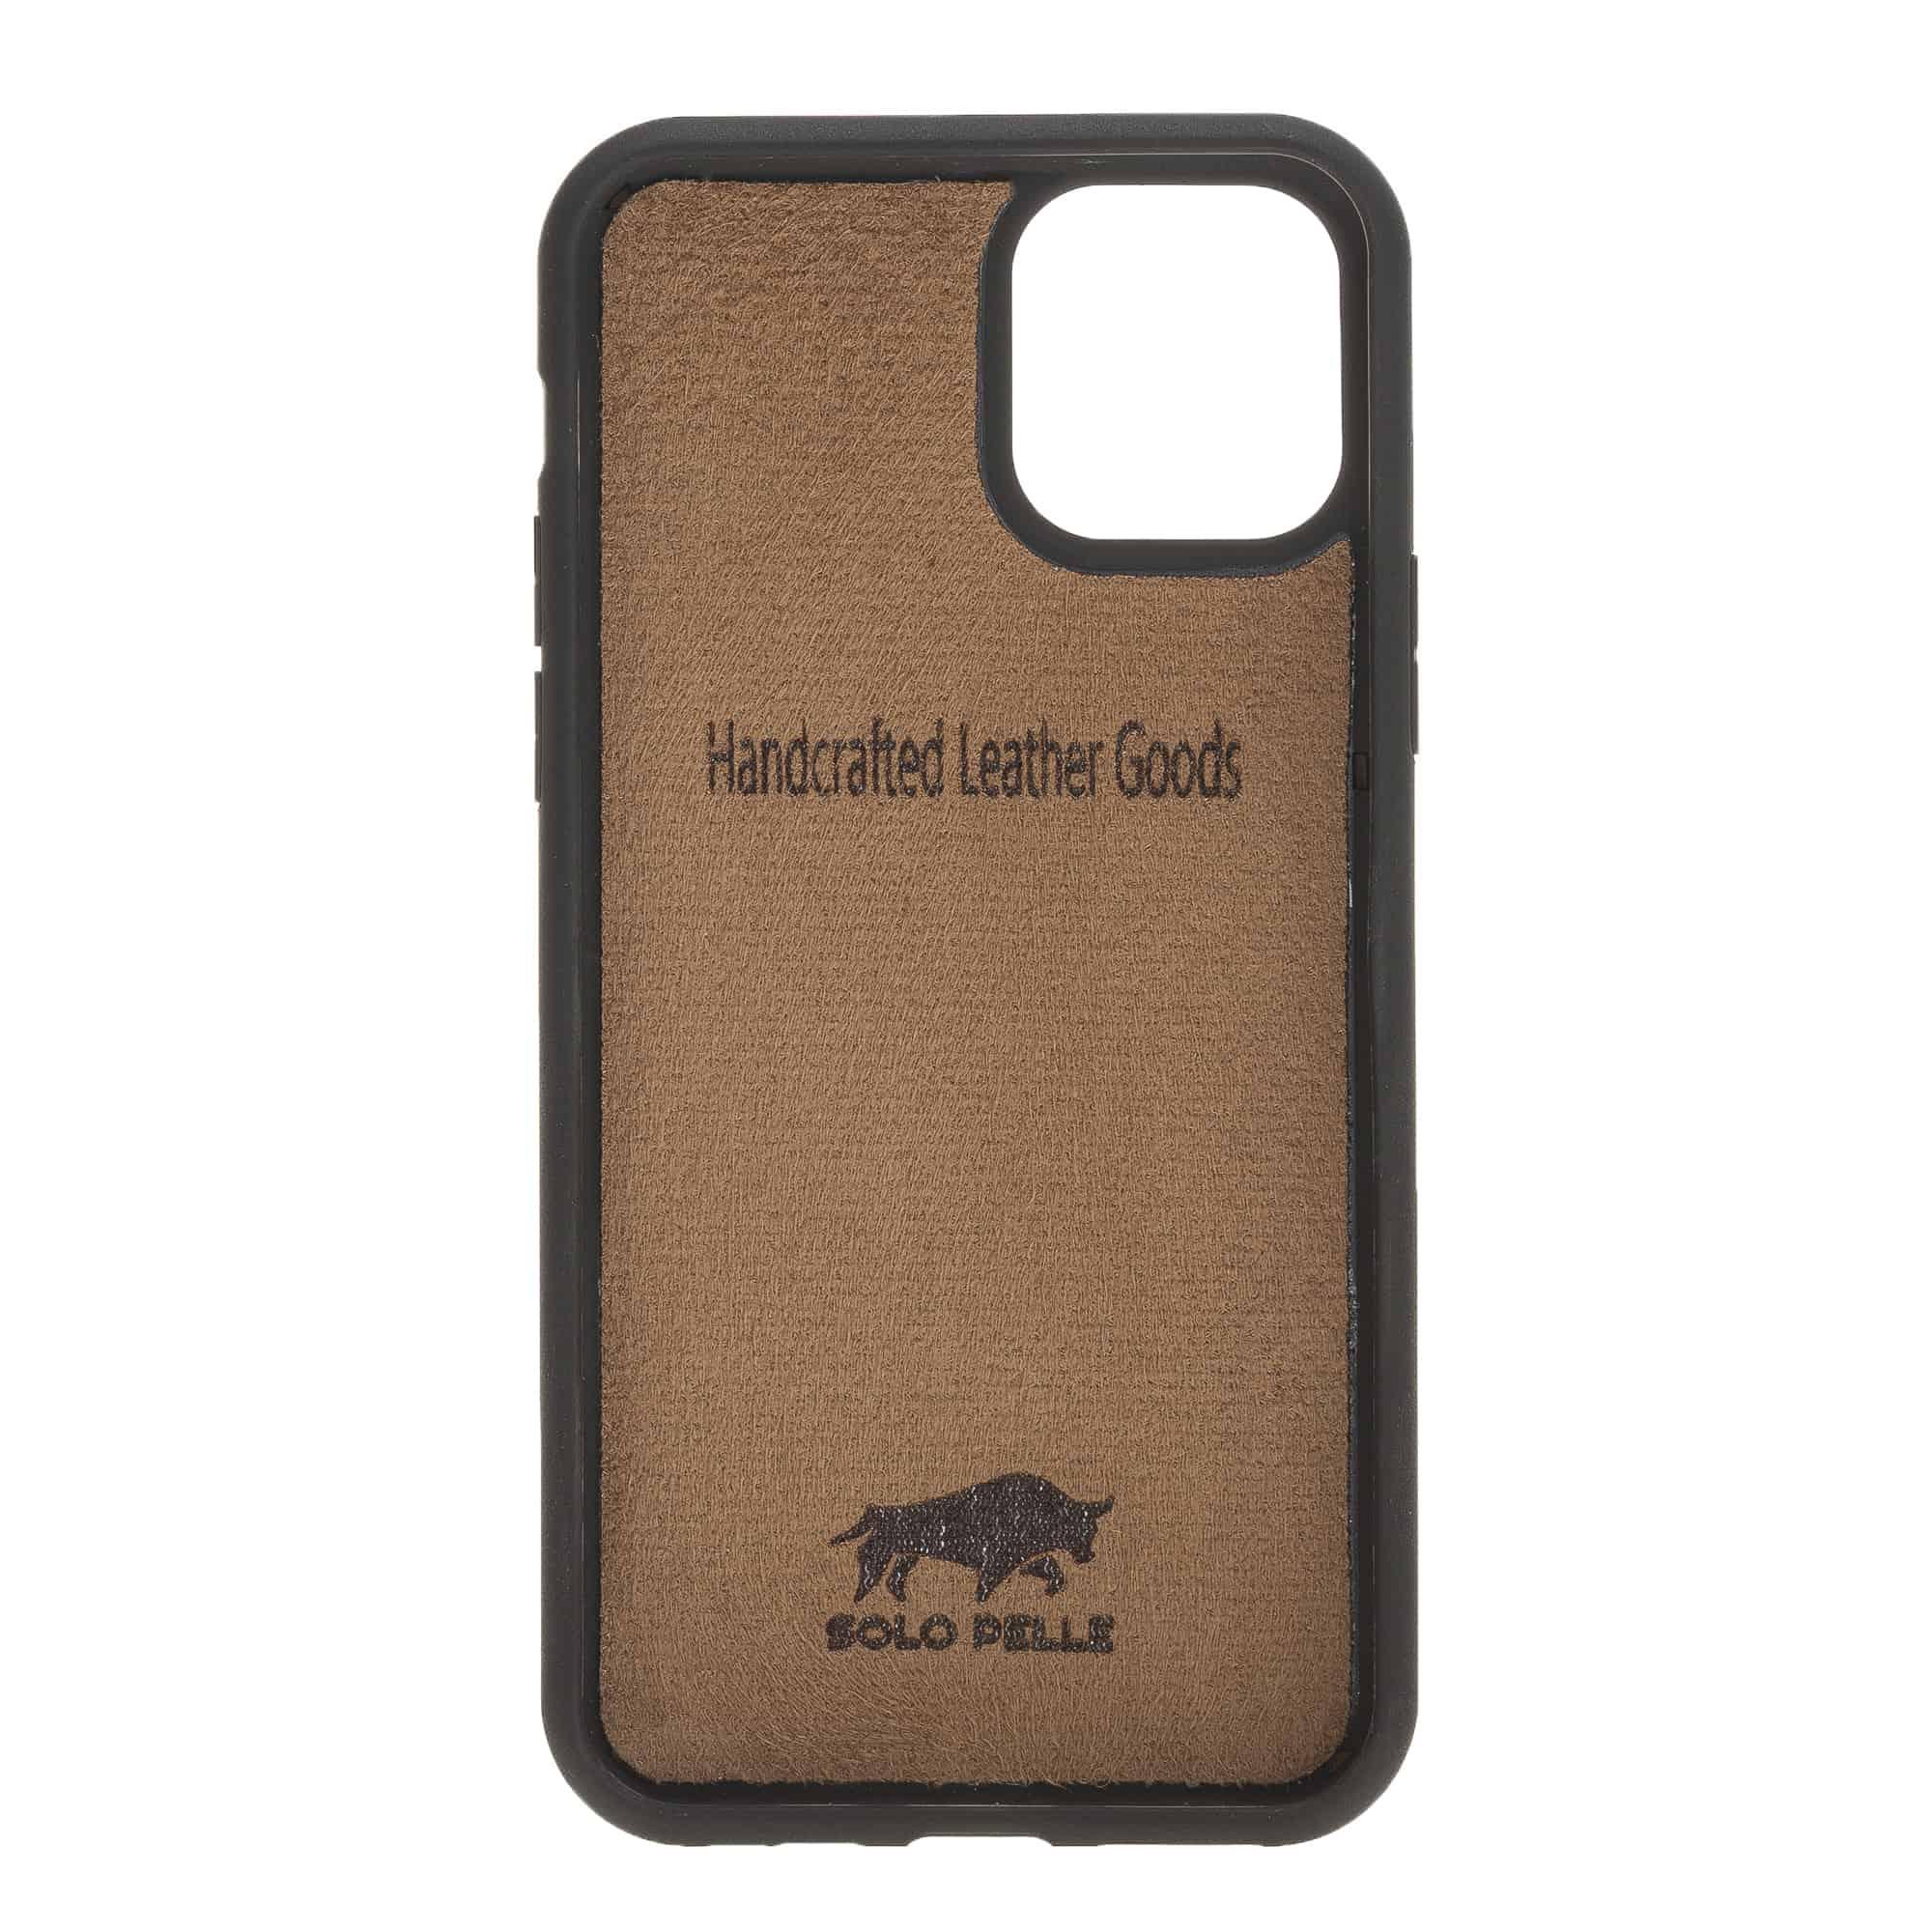 Solo Pelle Lederhülle für das iPhone 11 Pro in 5.8 Zoll Stanford Case Leder Hülle Ledertasche Backcover aus echtem Leder (Camel Braun)